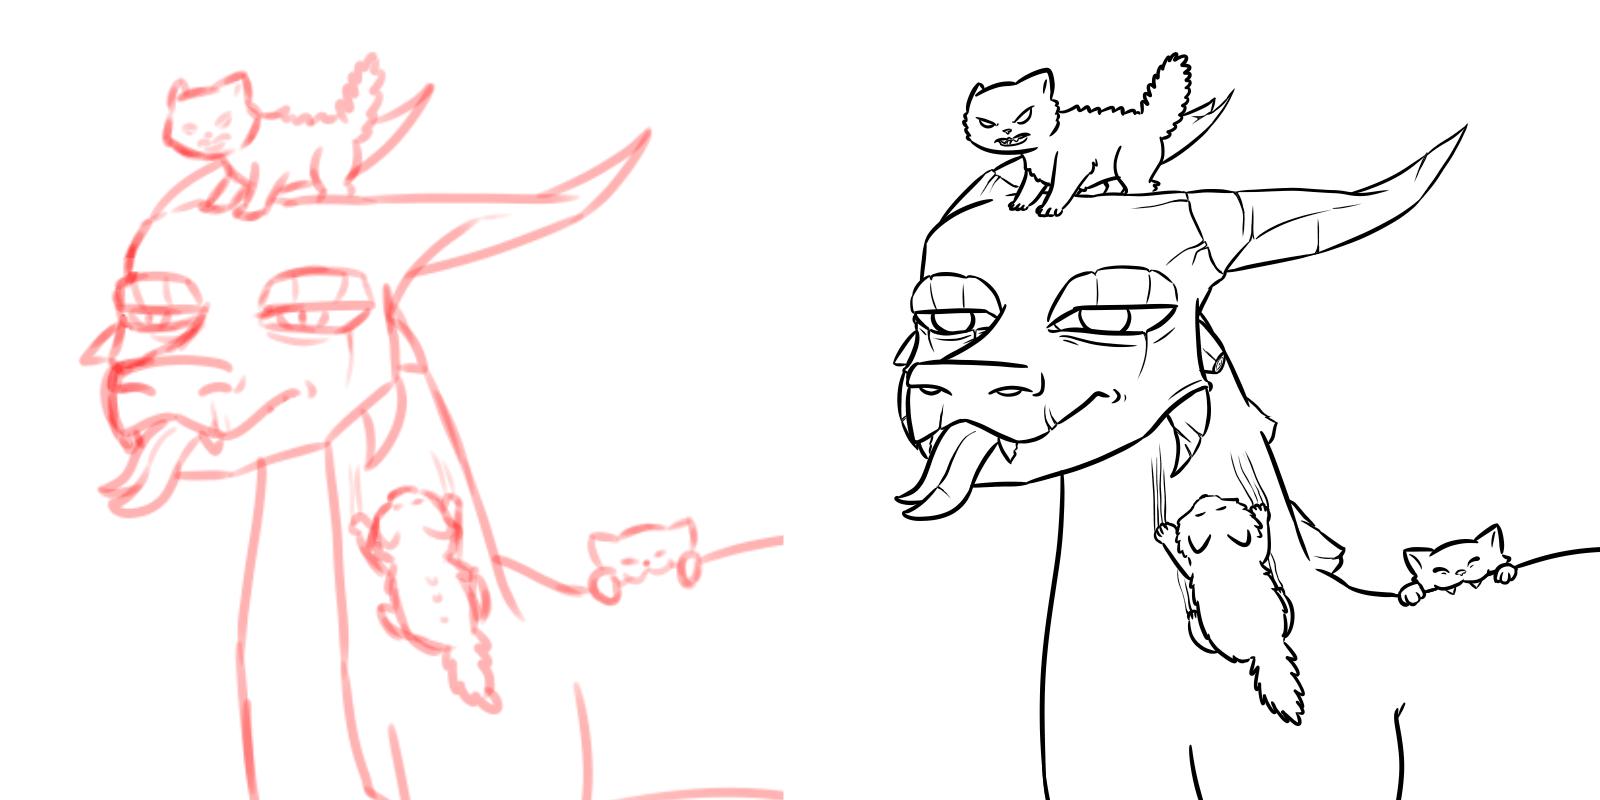 Dragons vs Kittens wip process